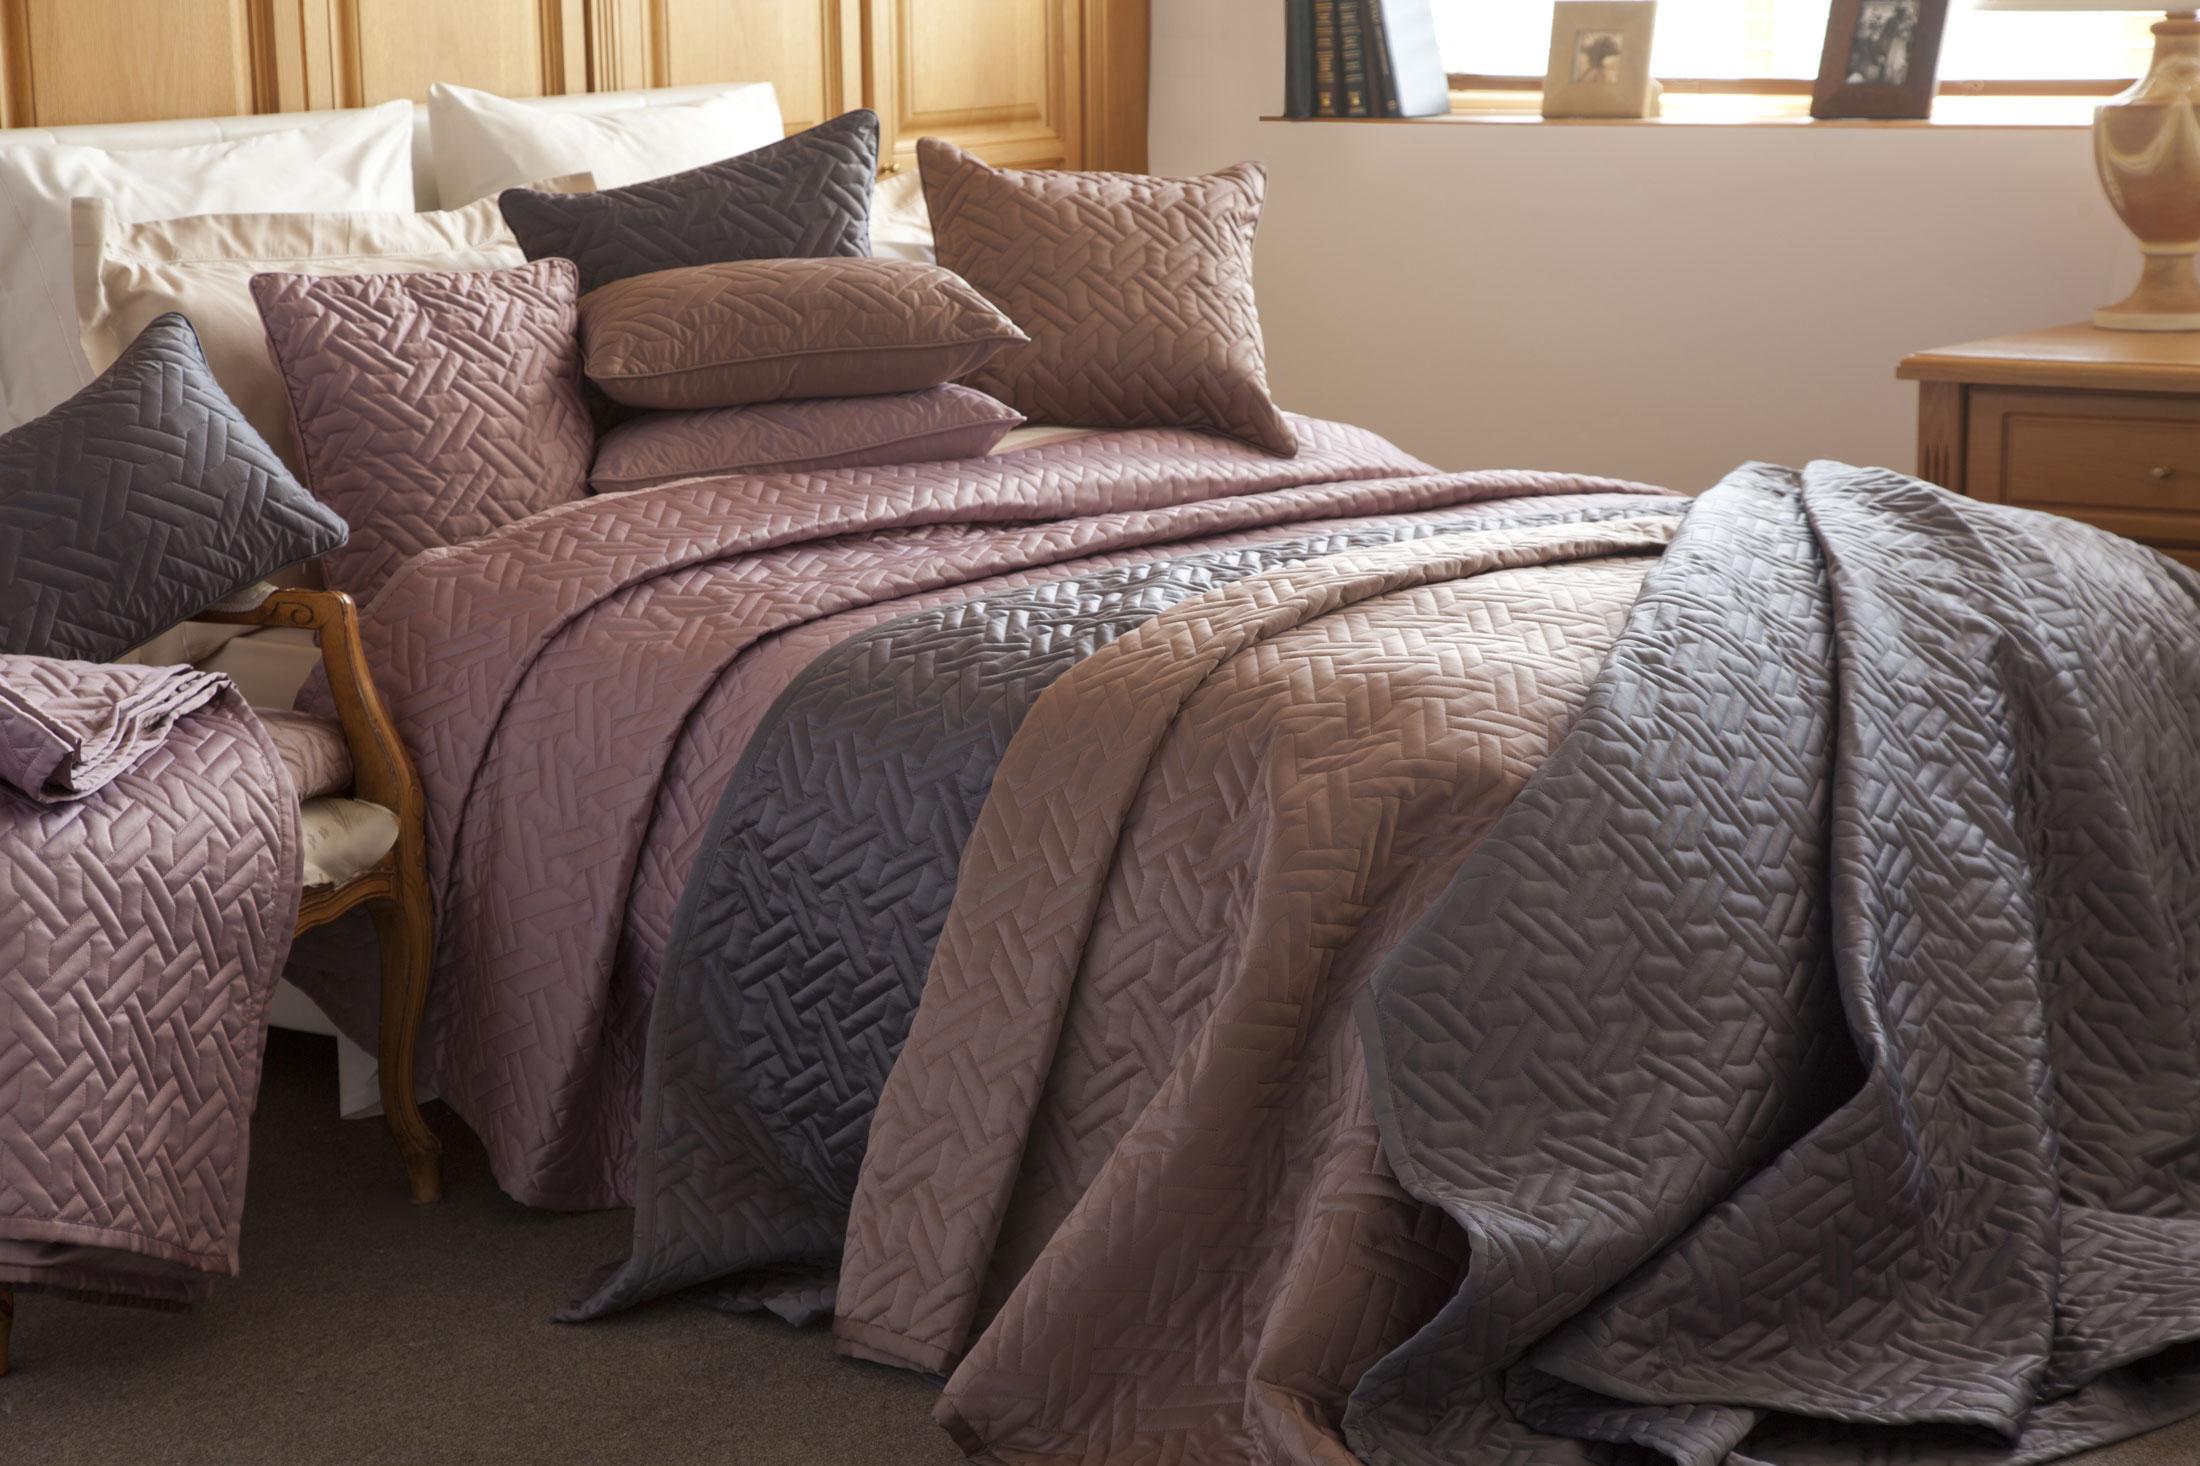 Bedspreads (21)